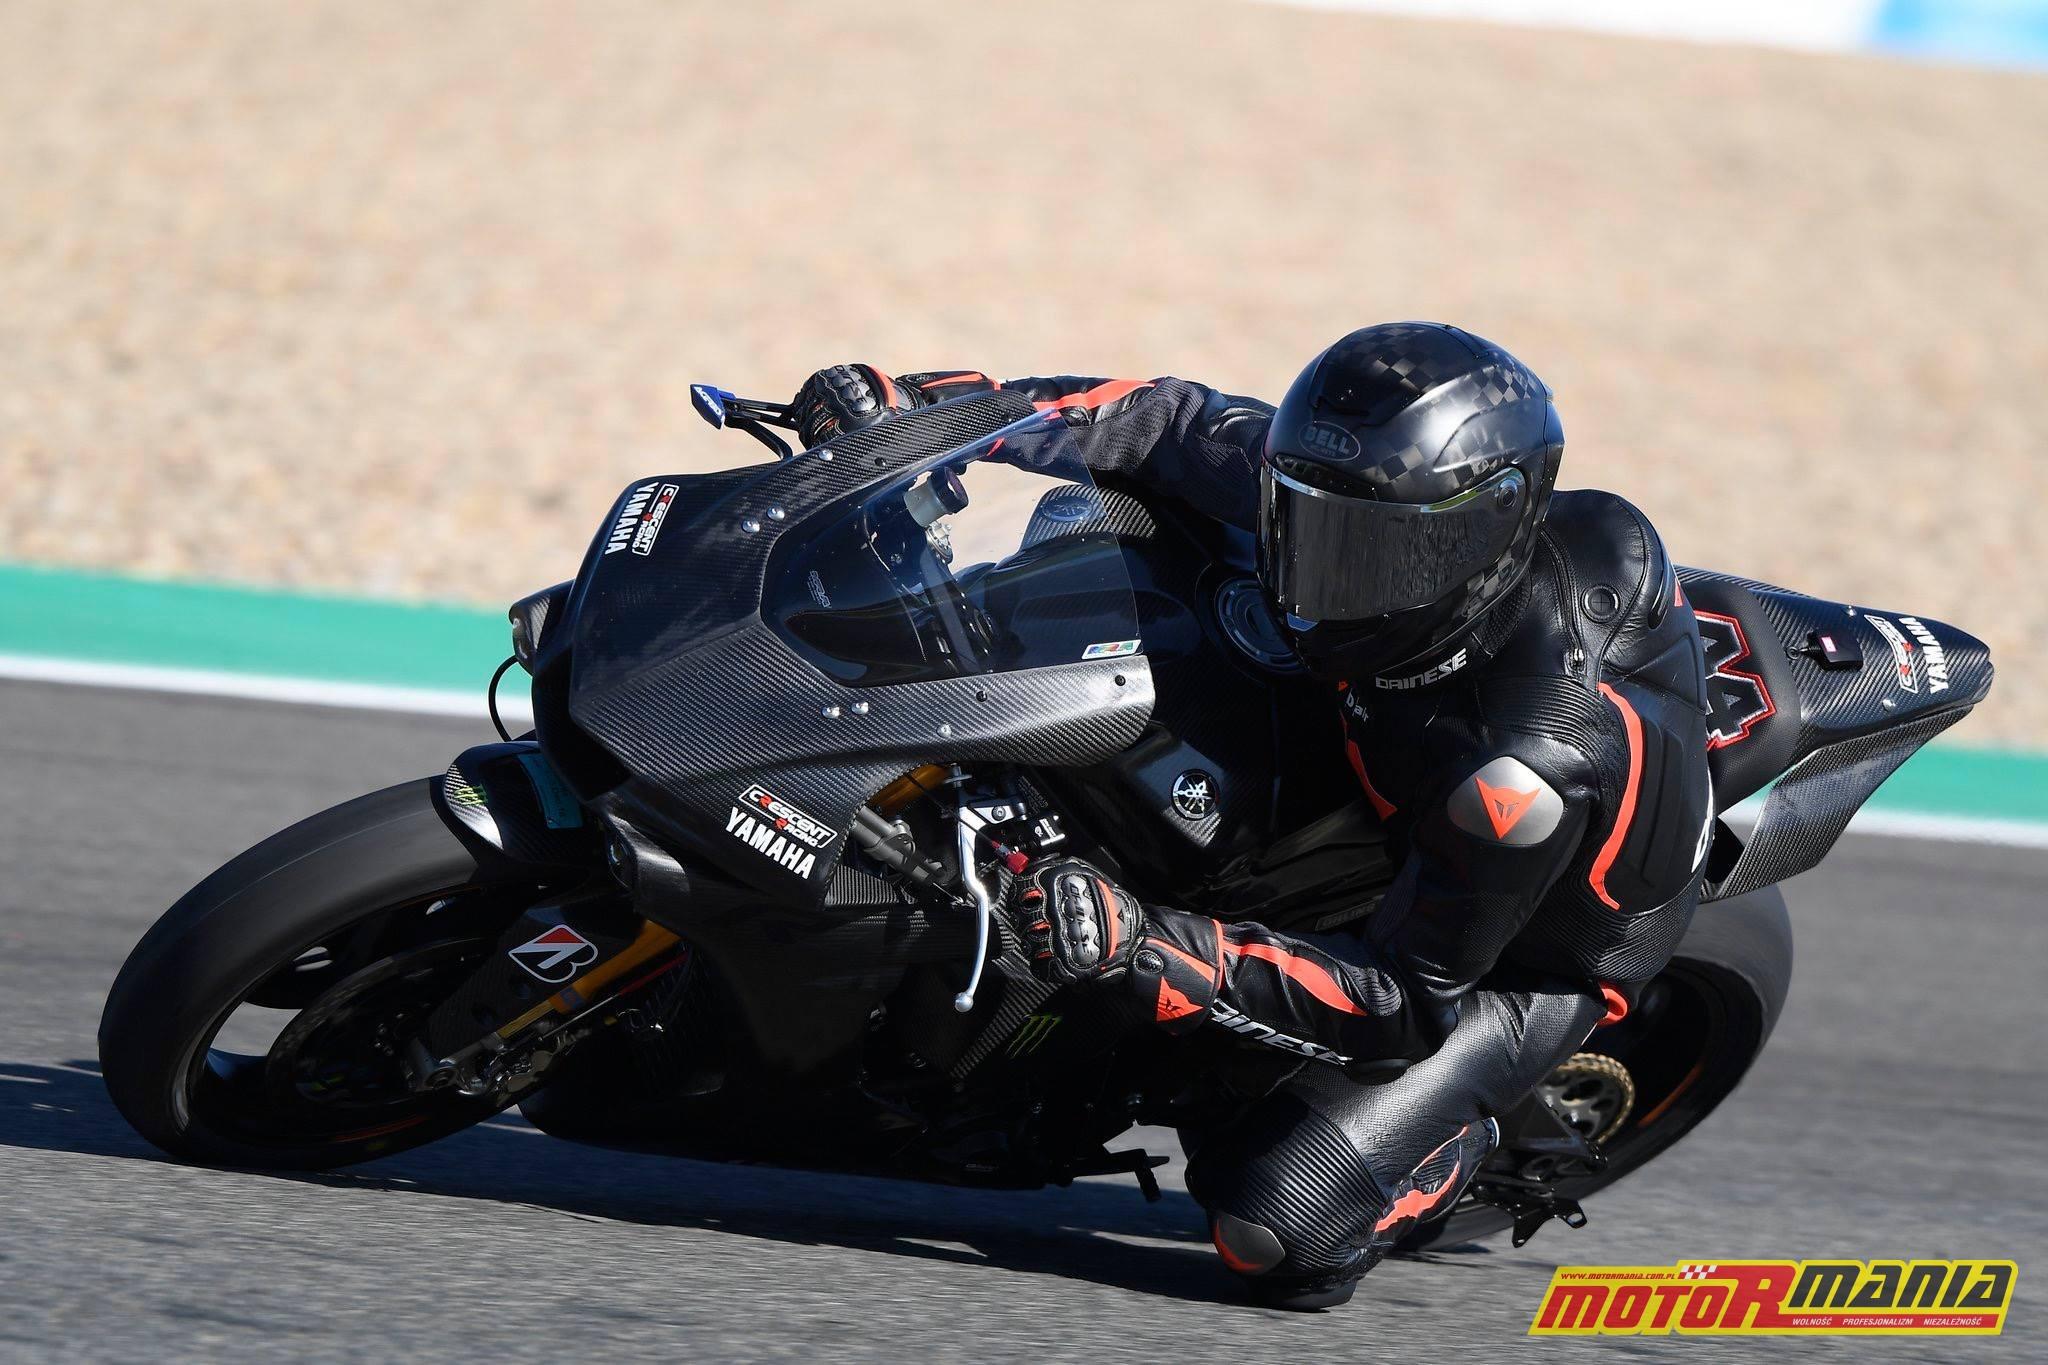 Lewis Hamilton R1 Carbon Pata Yamaha Jerez 2018 (4)